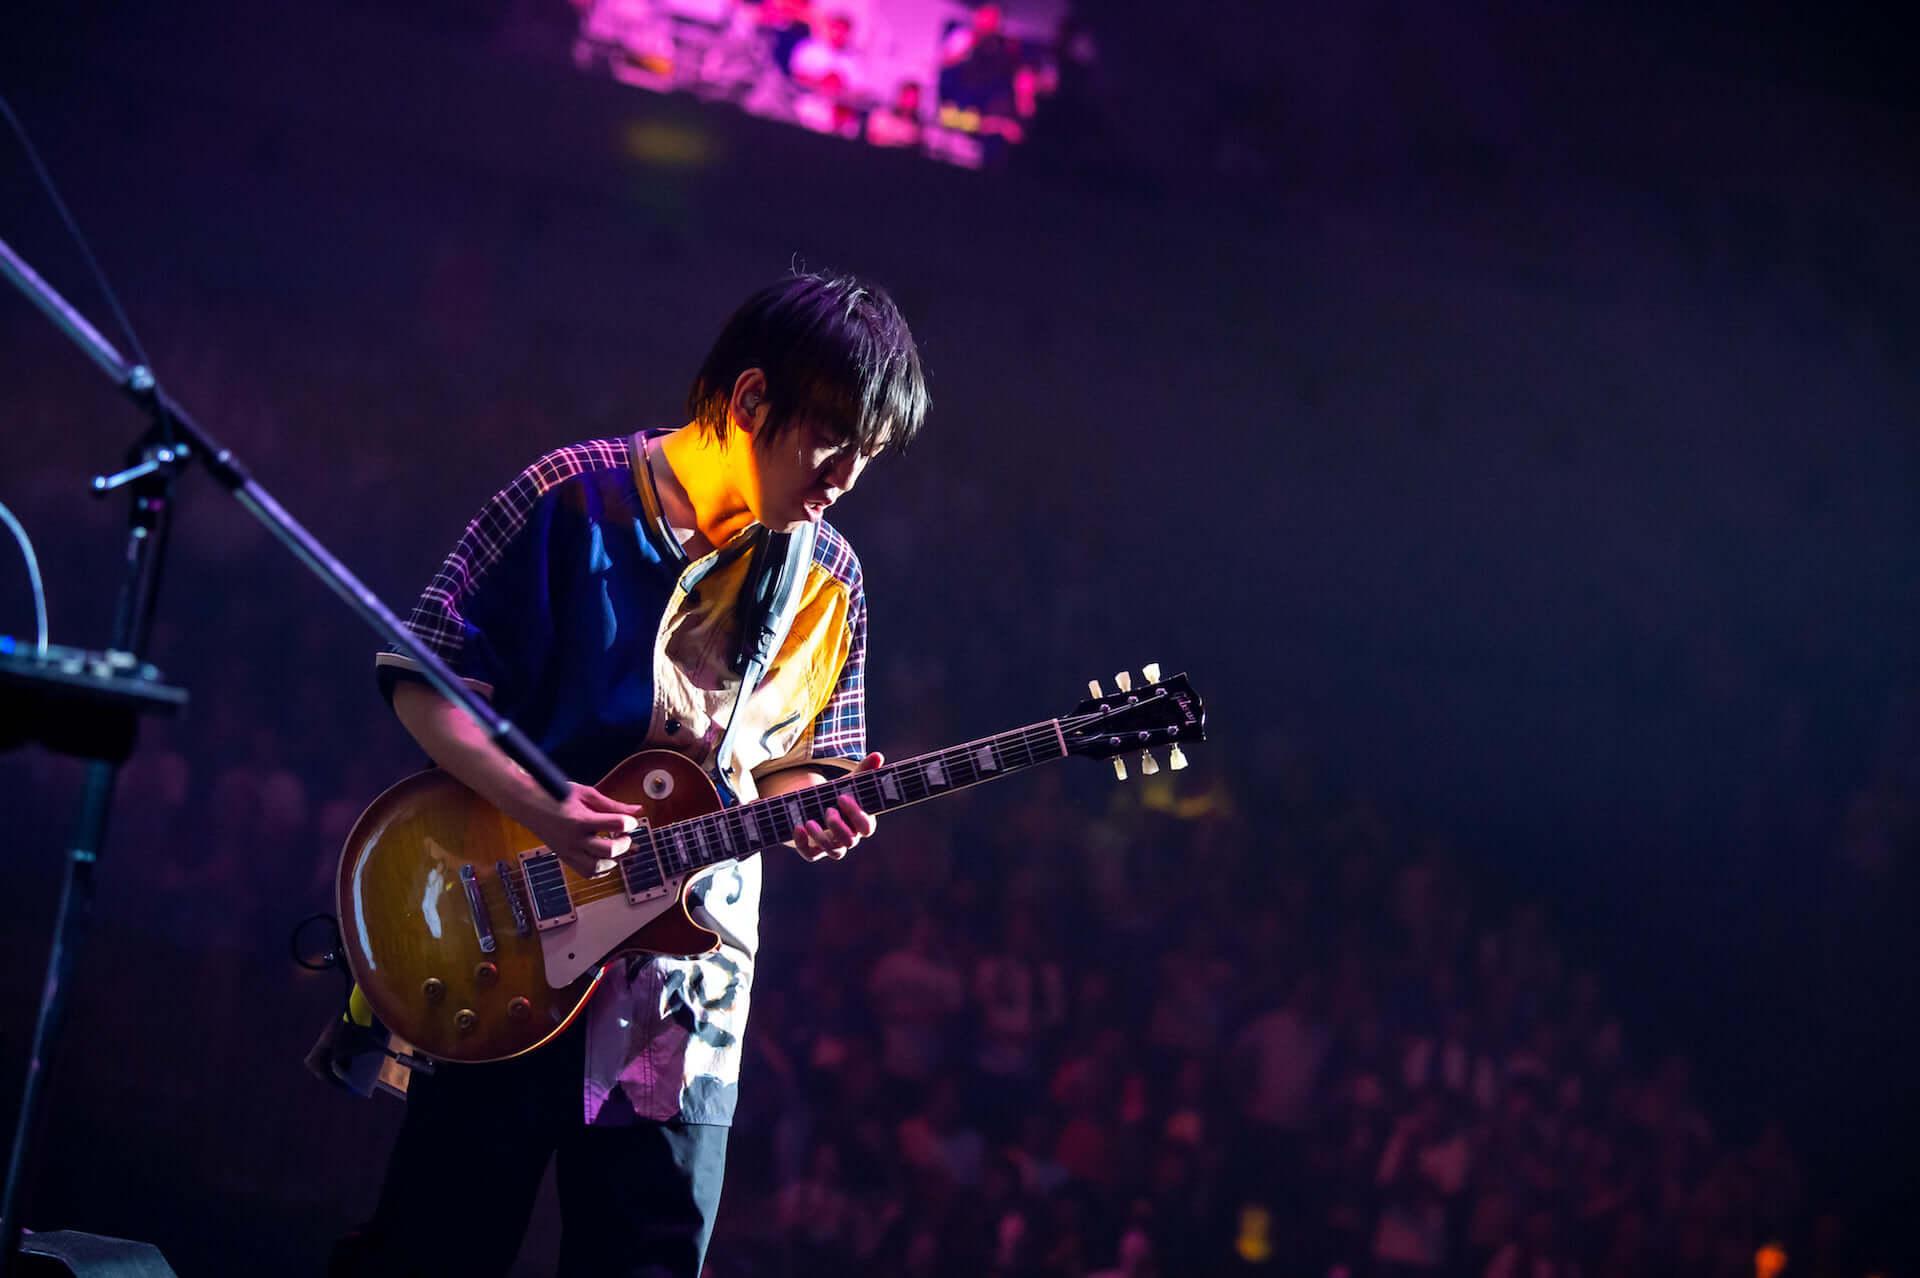 RADWIMPS横浜アリーナ公演のライブ写真が公開!<ANTI ANTI GENERATION TOUR 2019>レポート music190830_radwimps_live_17-1920x1278